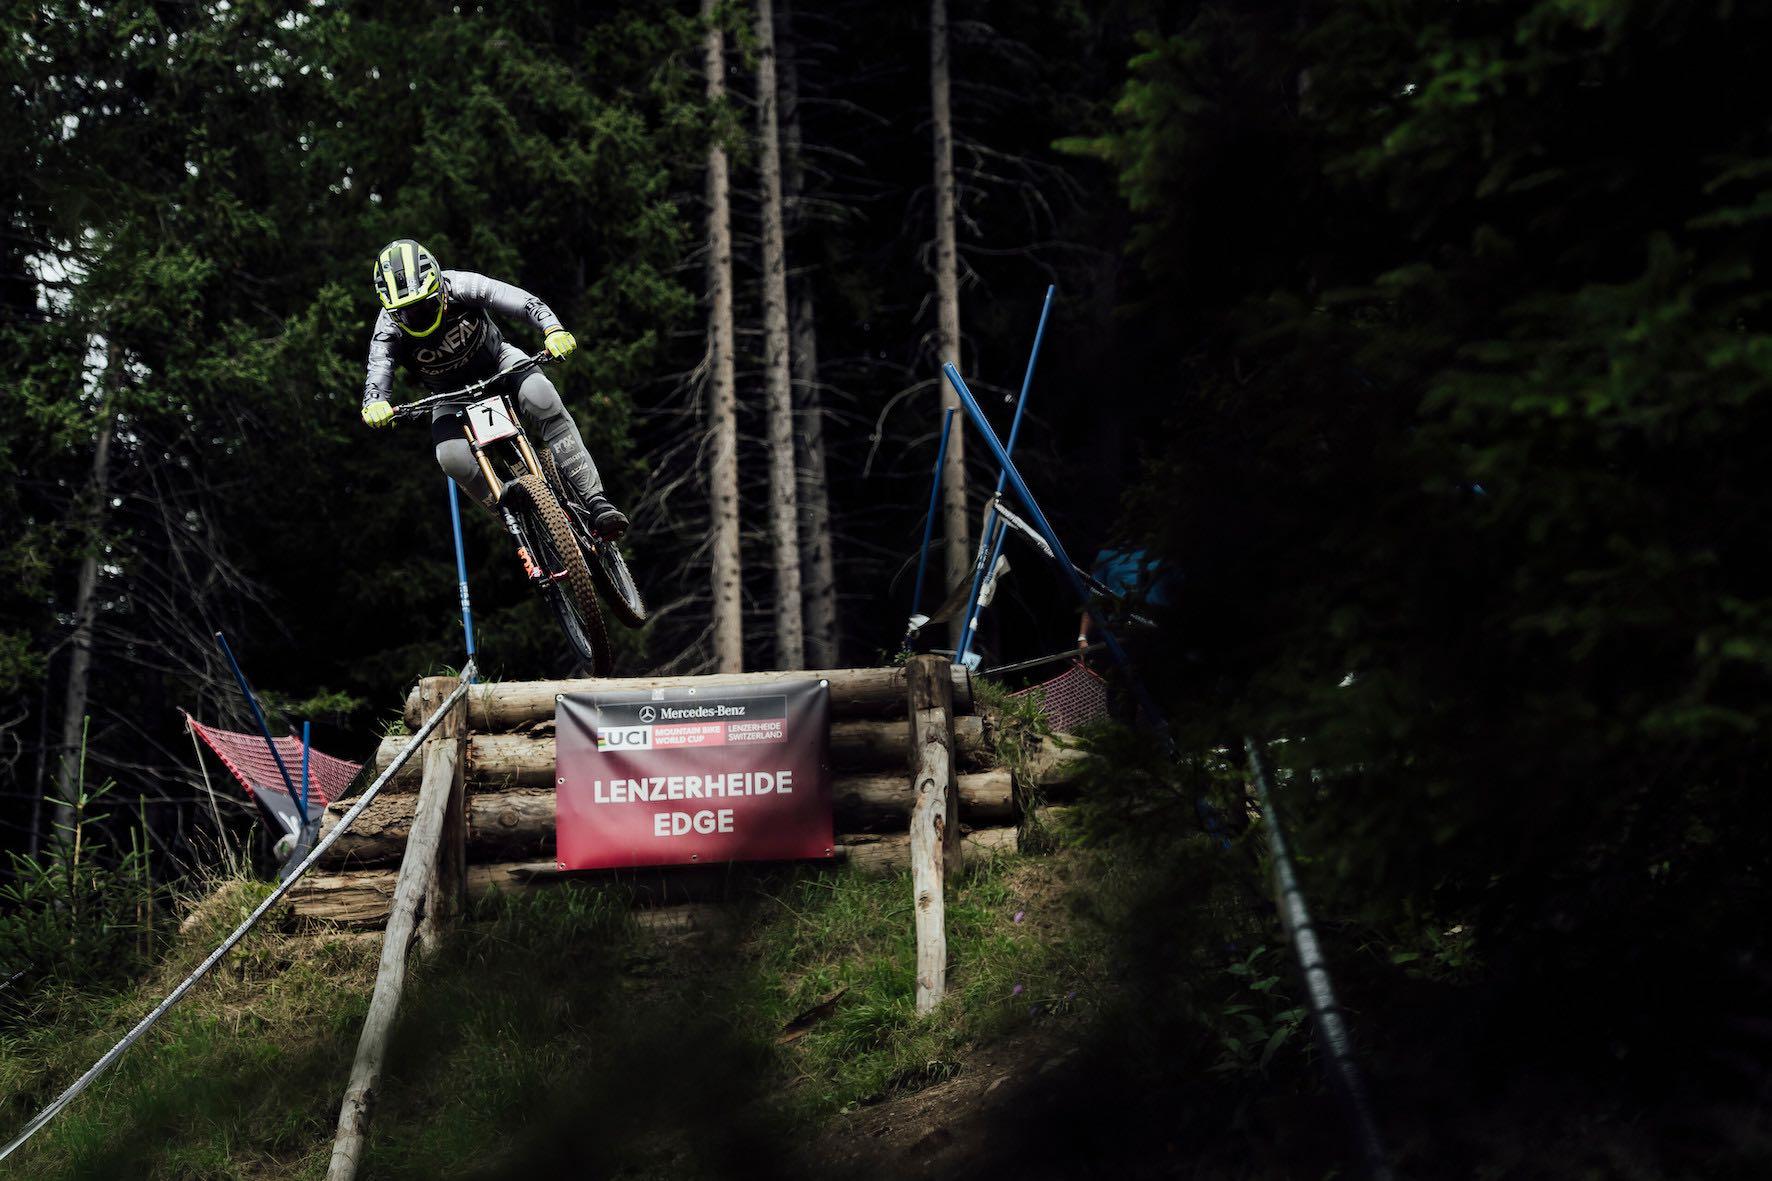 Greg Minnaar racing the 2019 Downhill MTB World Cup in Lenzerheide